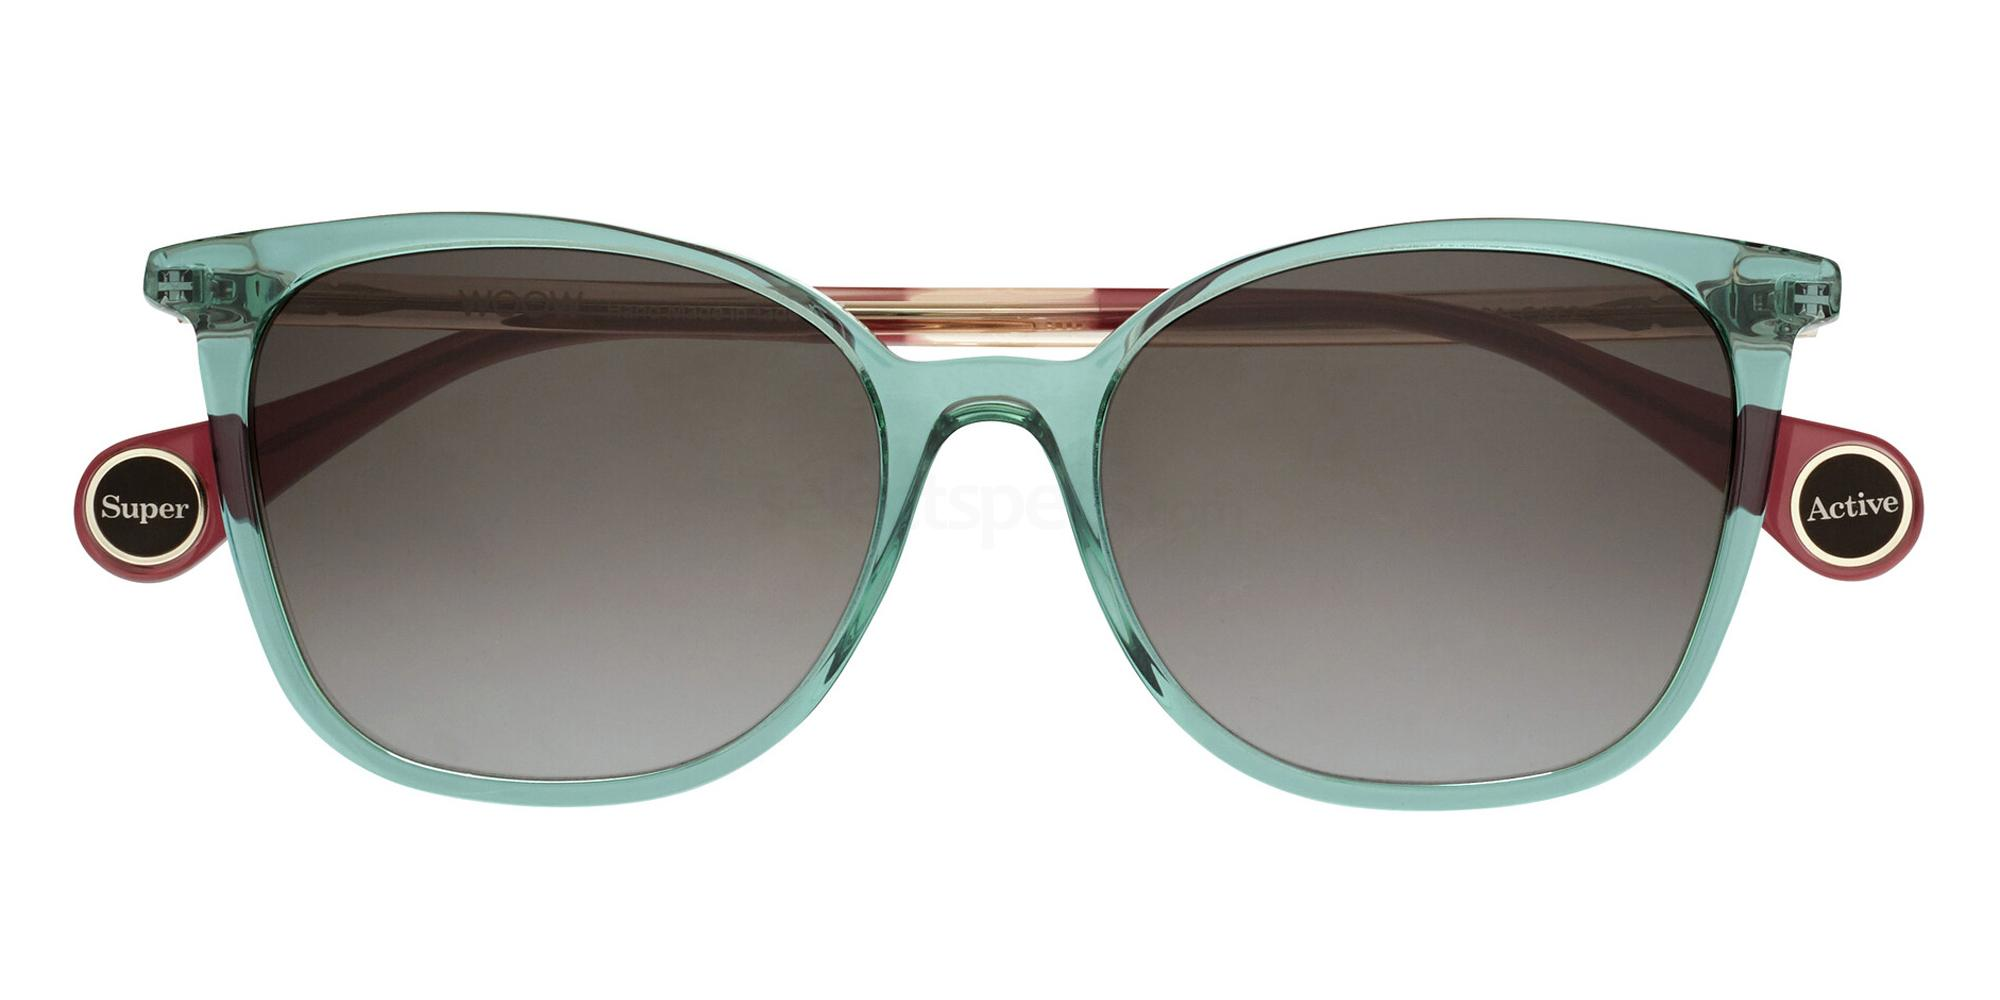 12184 SUPER ACTIVE 2 Sunglasses, Woow